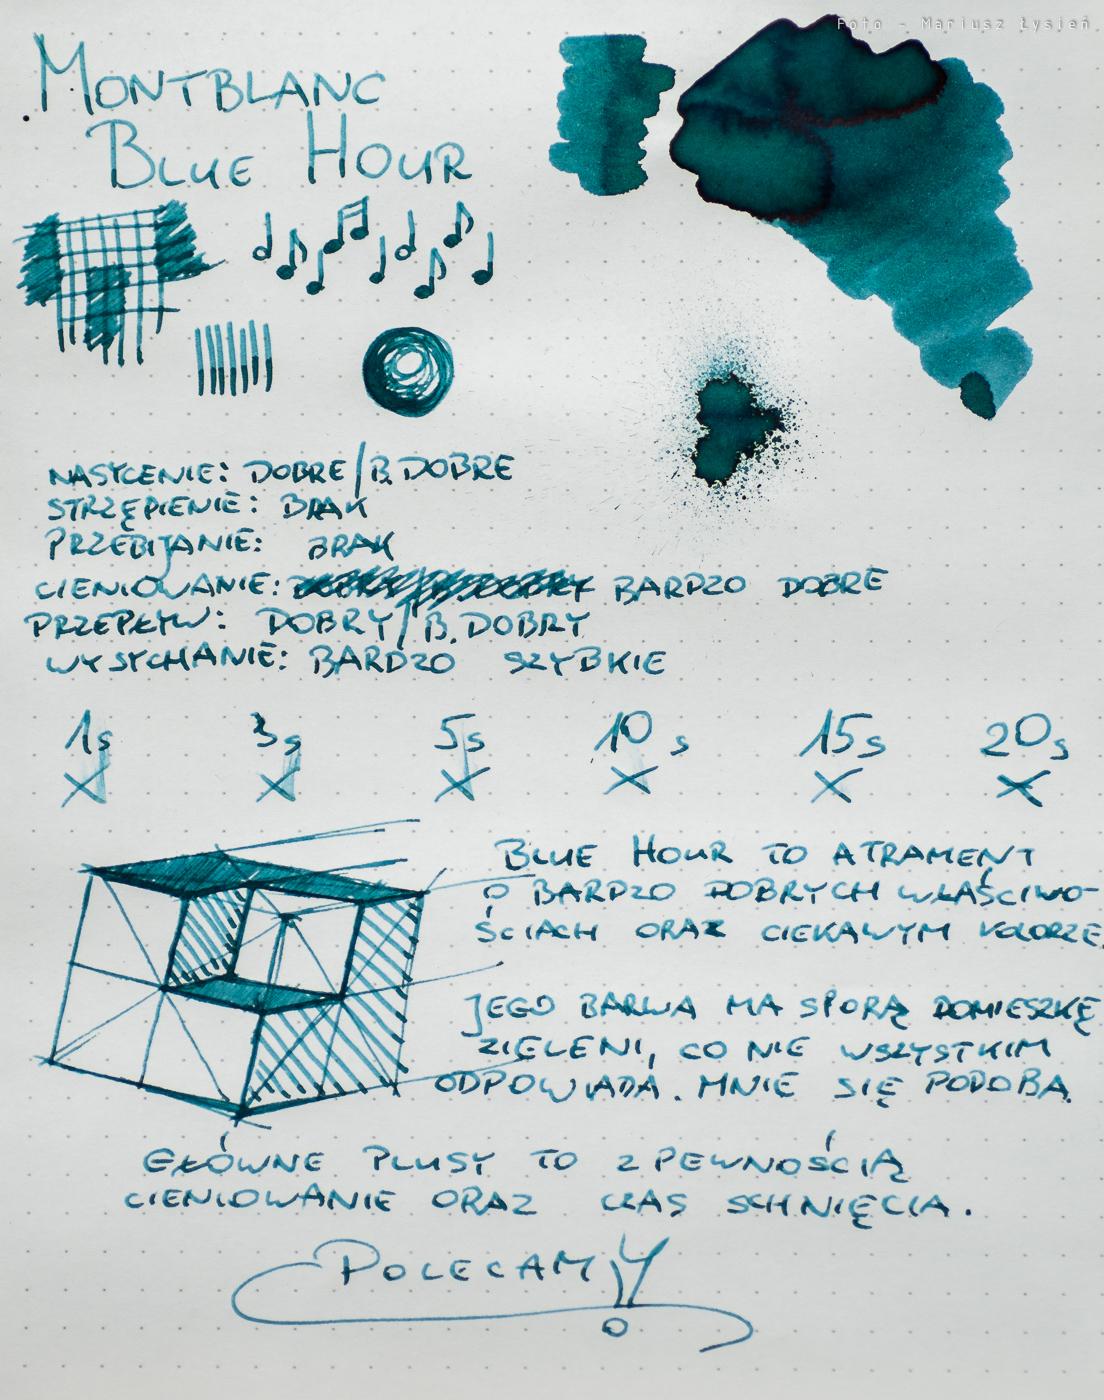 montblanc_bluehour_prsm-1.jpg